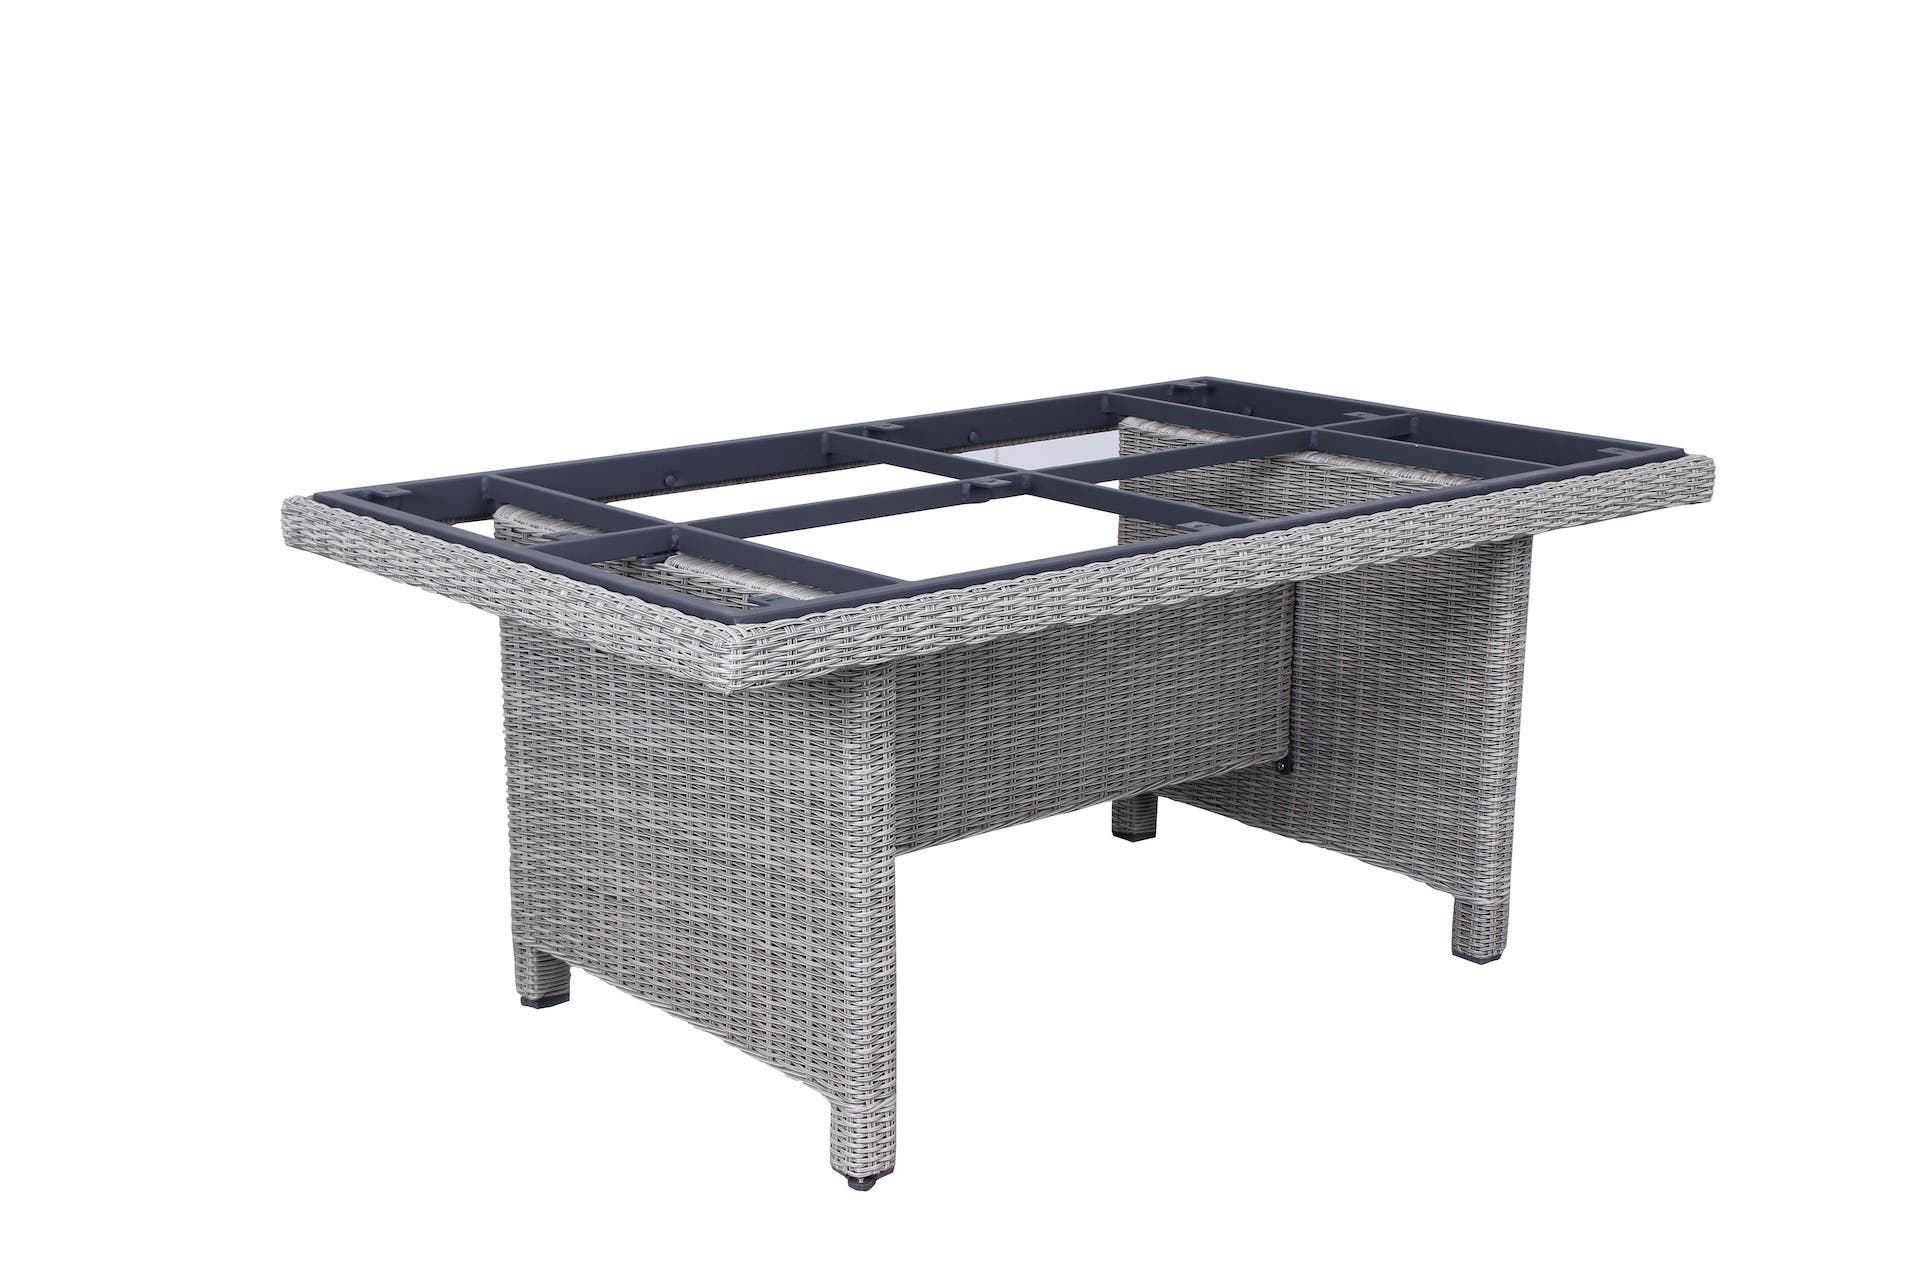 PALMA MODULAR Casual Dining Tischgestell 159 x 94 cm